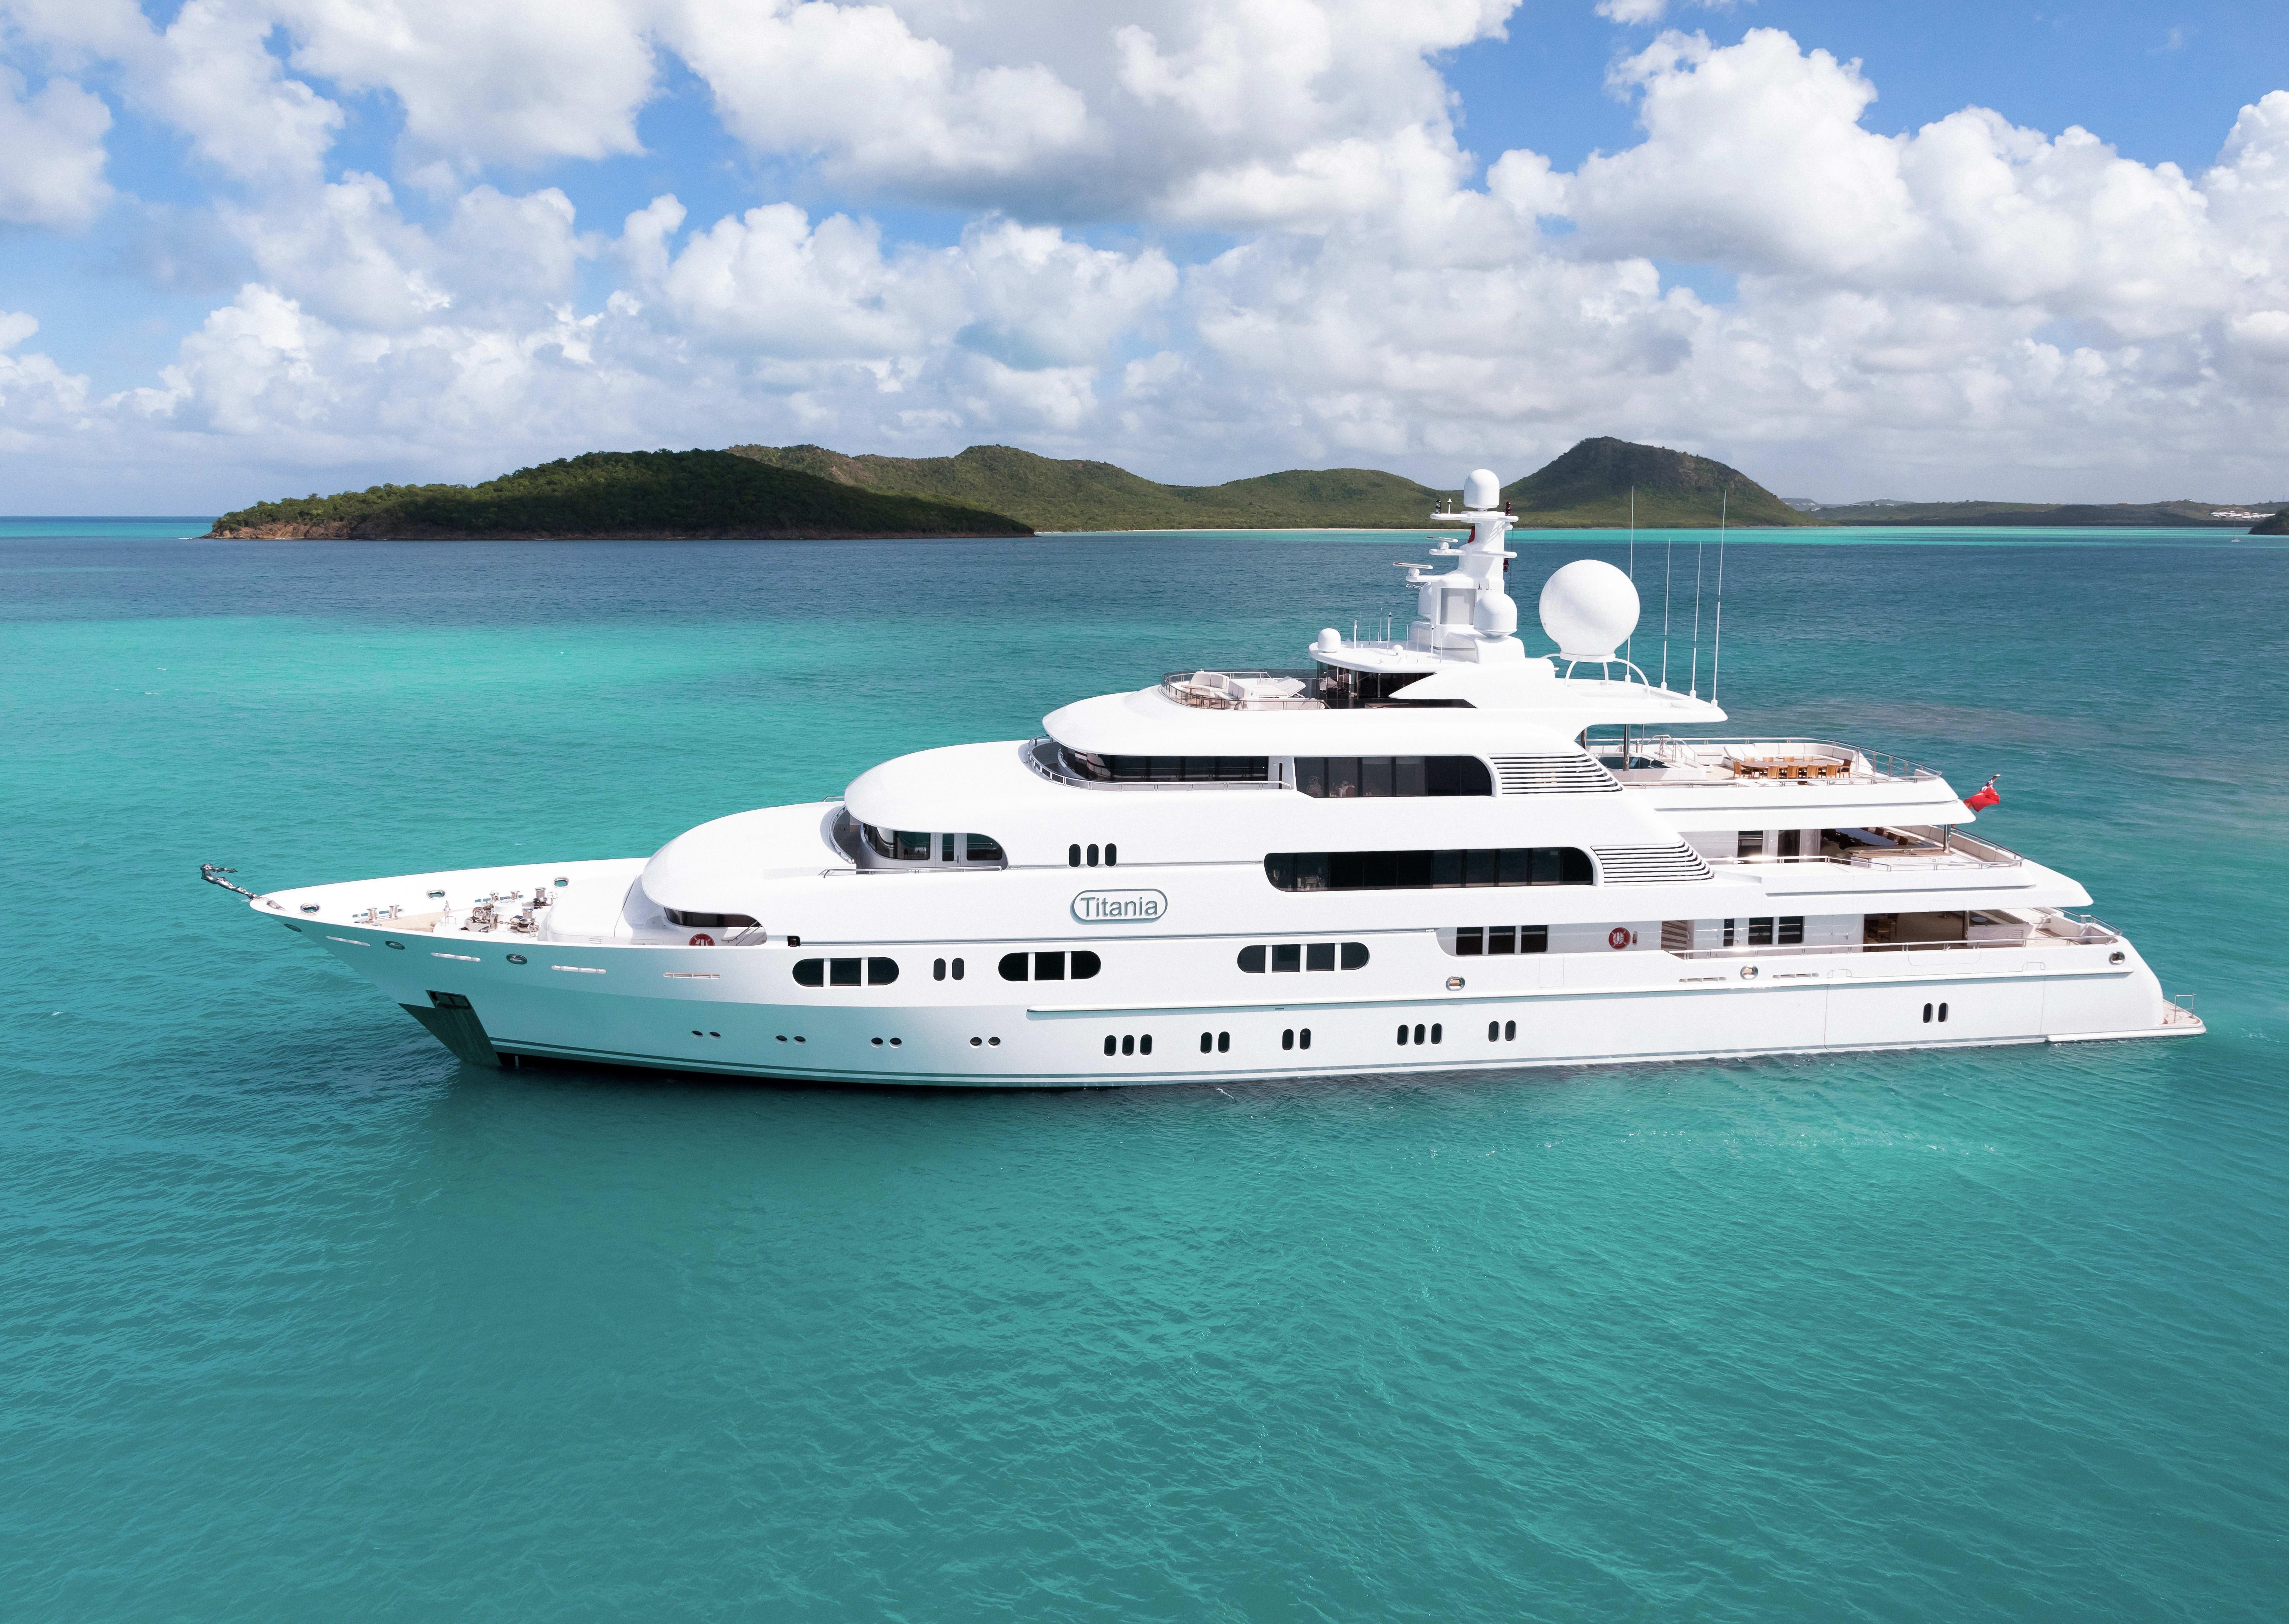 Image of Titania 73.0M (239.5FT) motor yacht